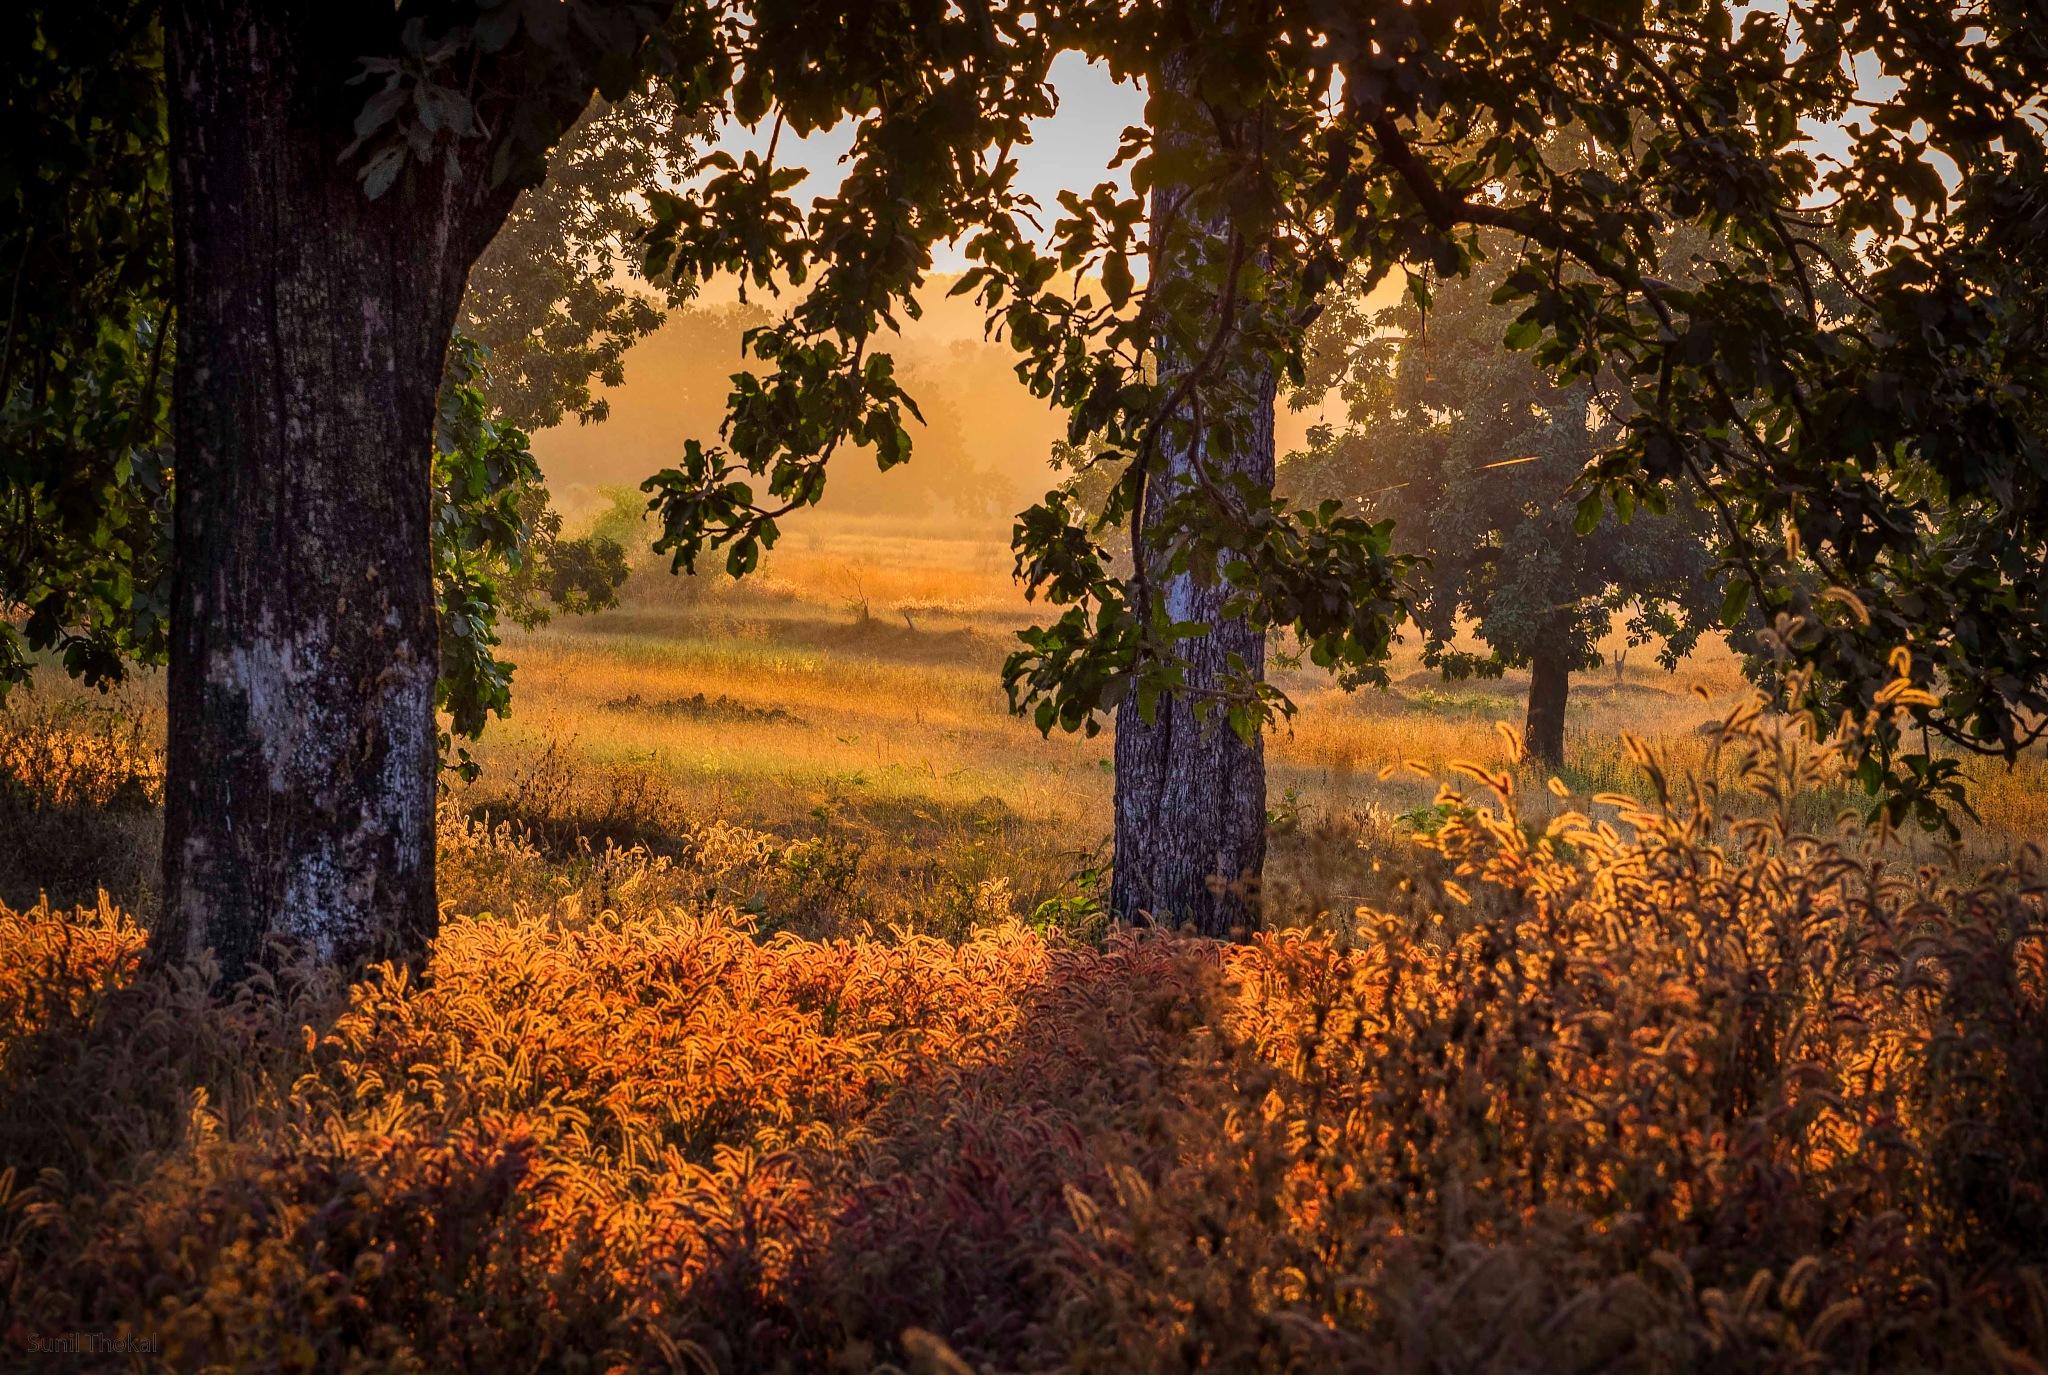 Landscape by Sunil Prabhakar Thokal